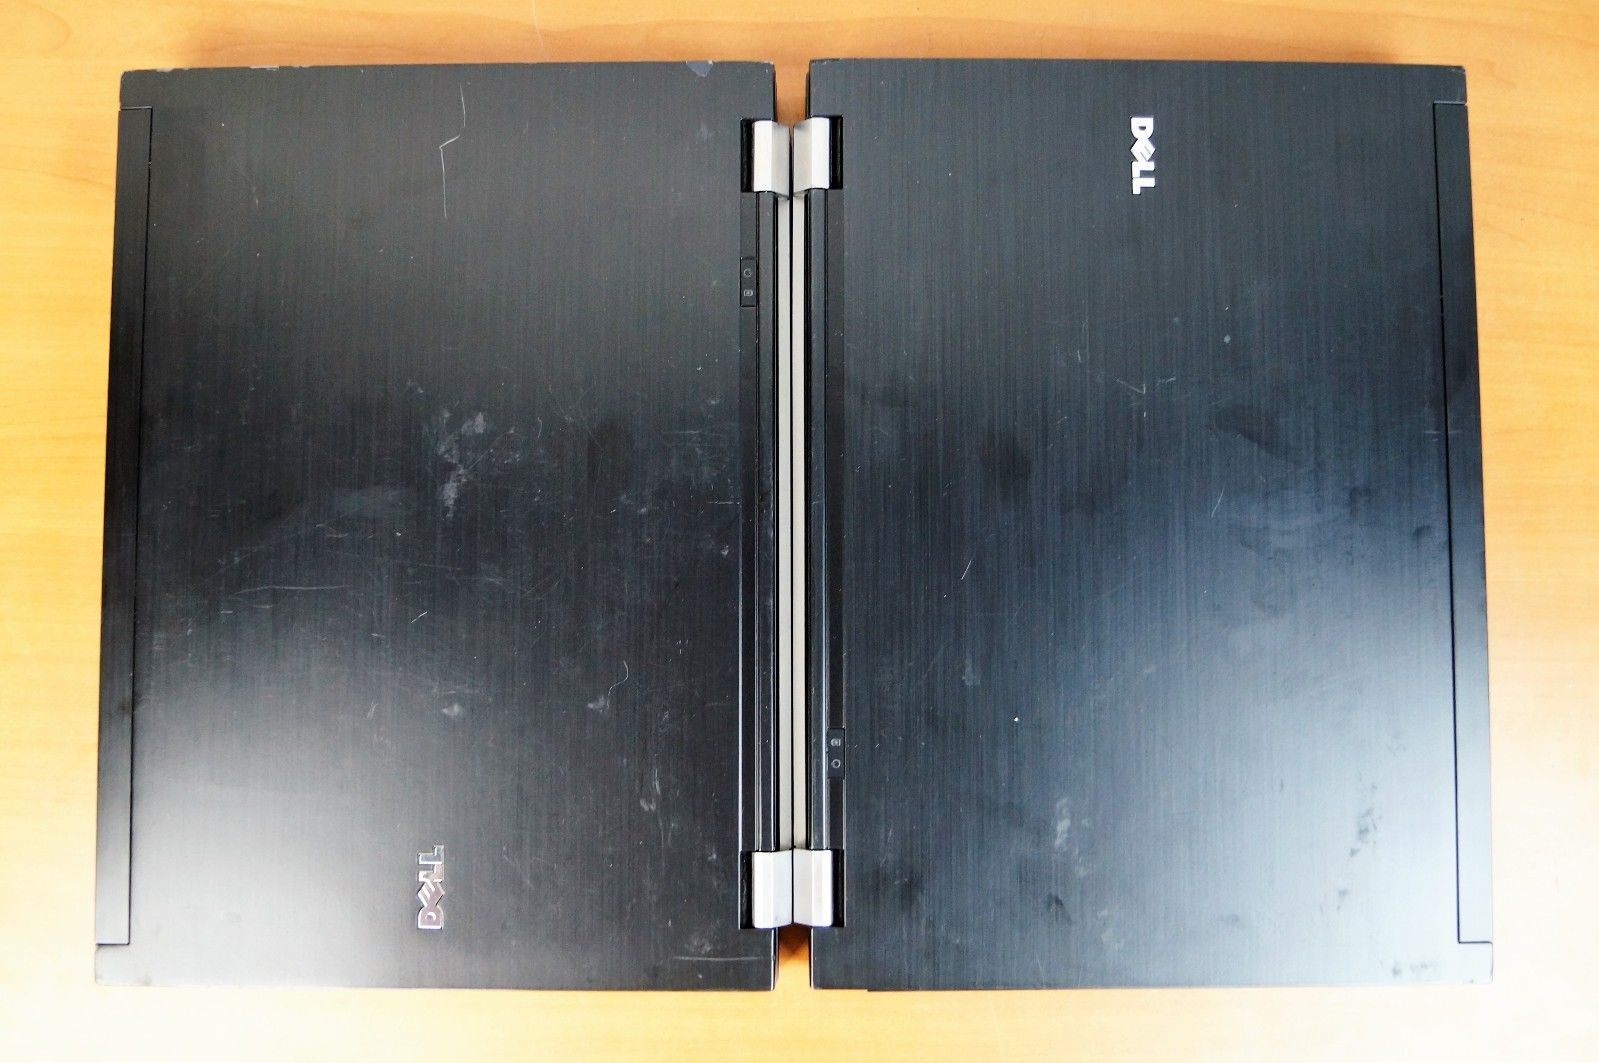 2 x Dell Latitude E6500 2.4GHz C2D P8600 4GB RAM No HD No Caddy No AC Adapter